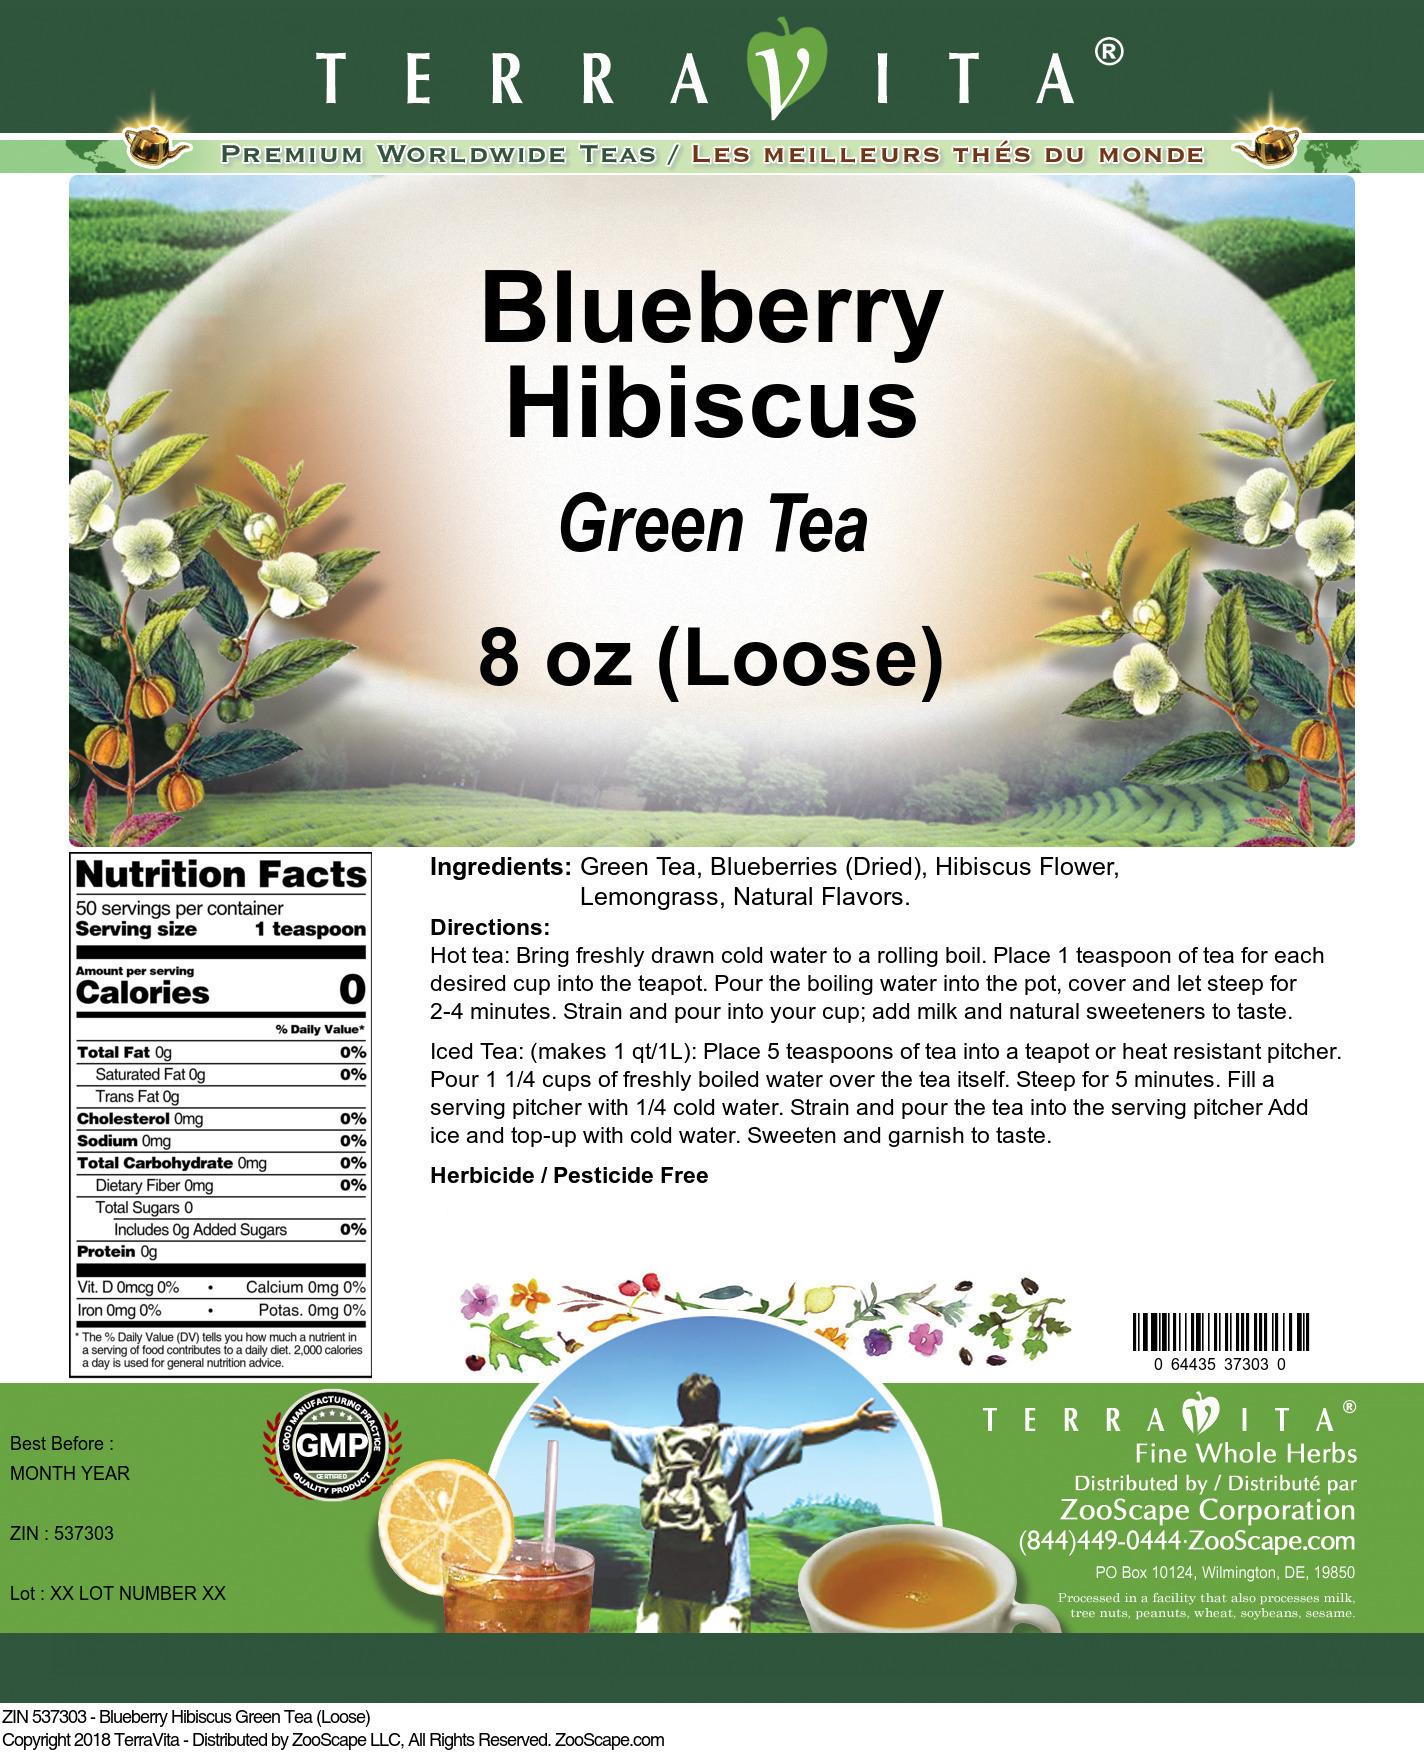 Blueberry Hibiscus Green Tea